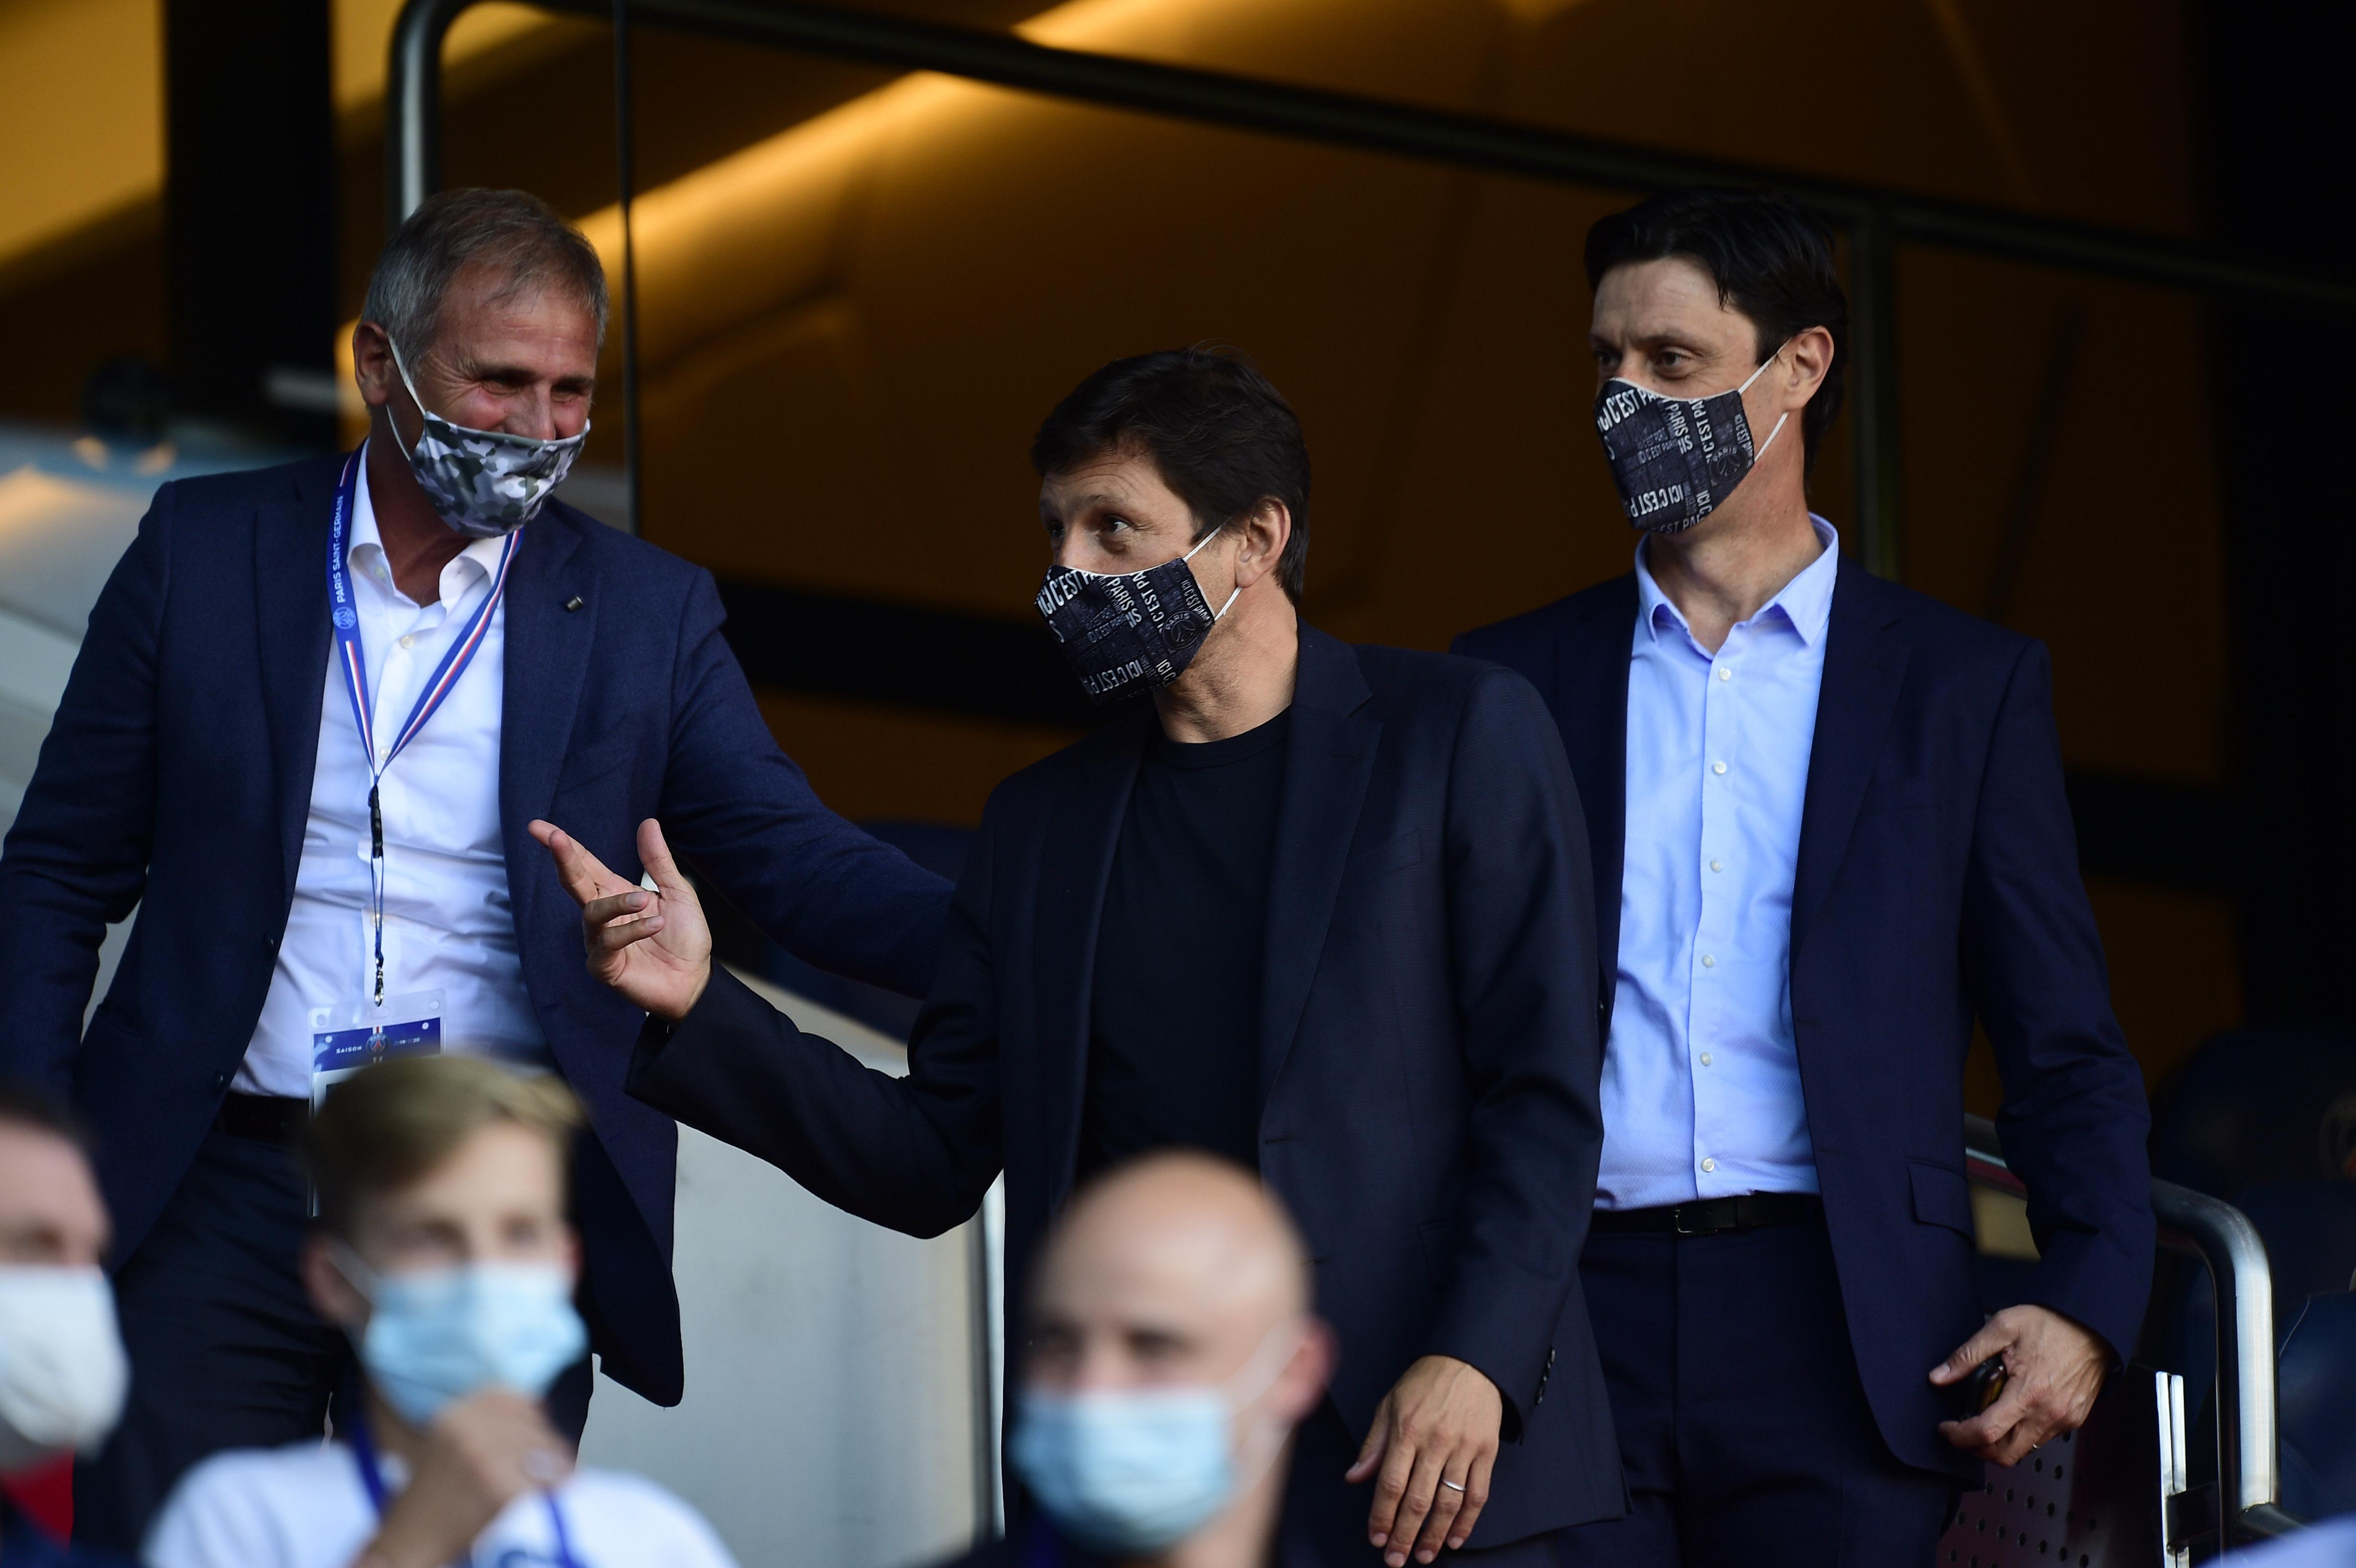 Football - Ligue 1 - PSG : sans micro ni caméra, Leonardo joue au pompier de service